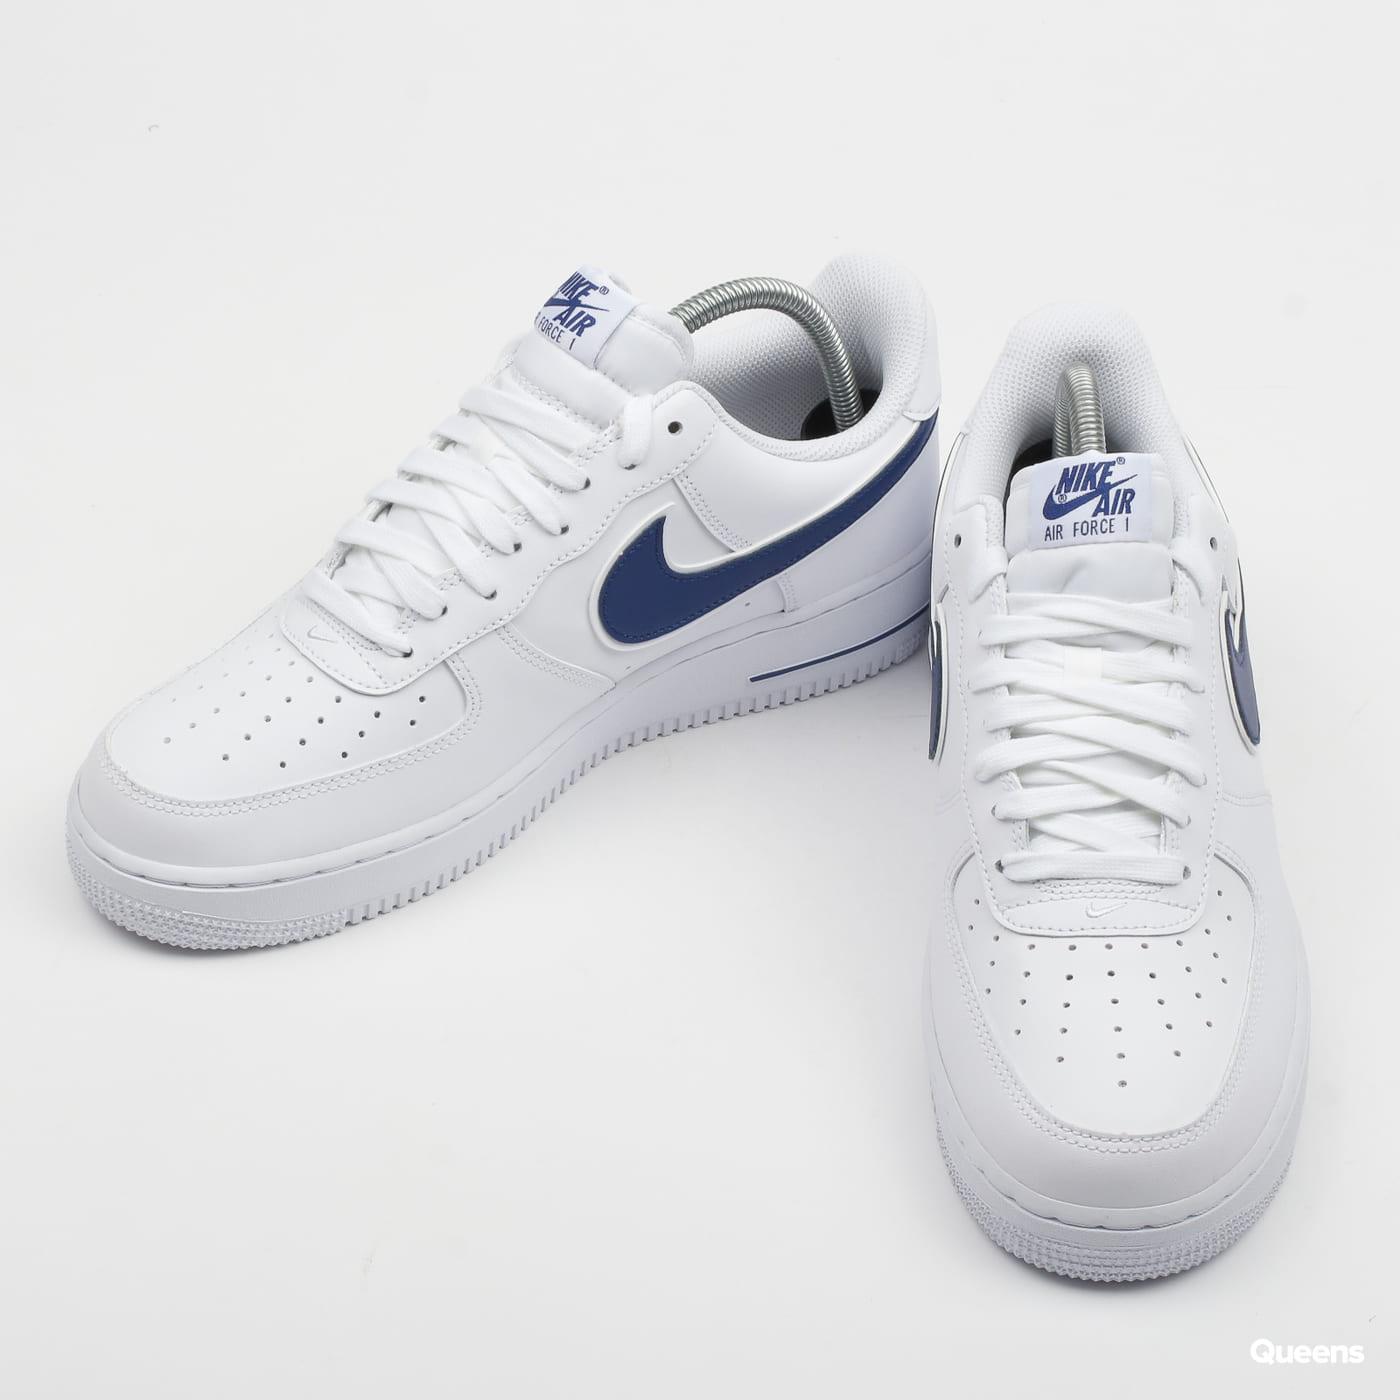 separation shoes 7ec37 ab080 Zoom in Zoom in Zoom in Zoom in Zoom in. Nike Air Force 1  07 3 white   deep  royal